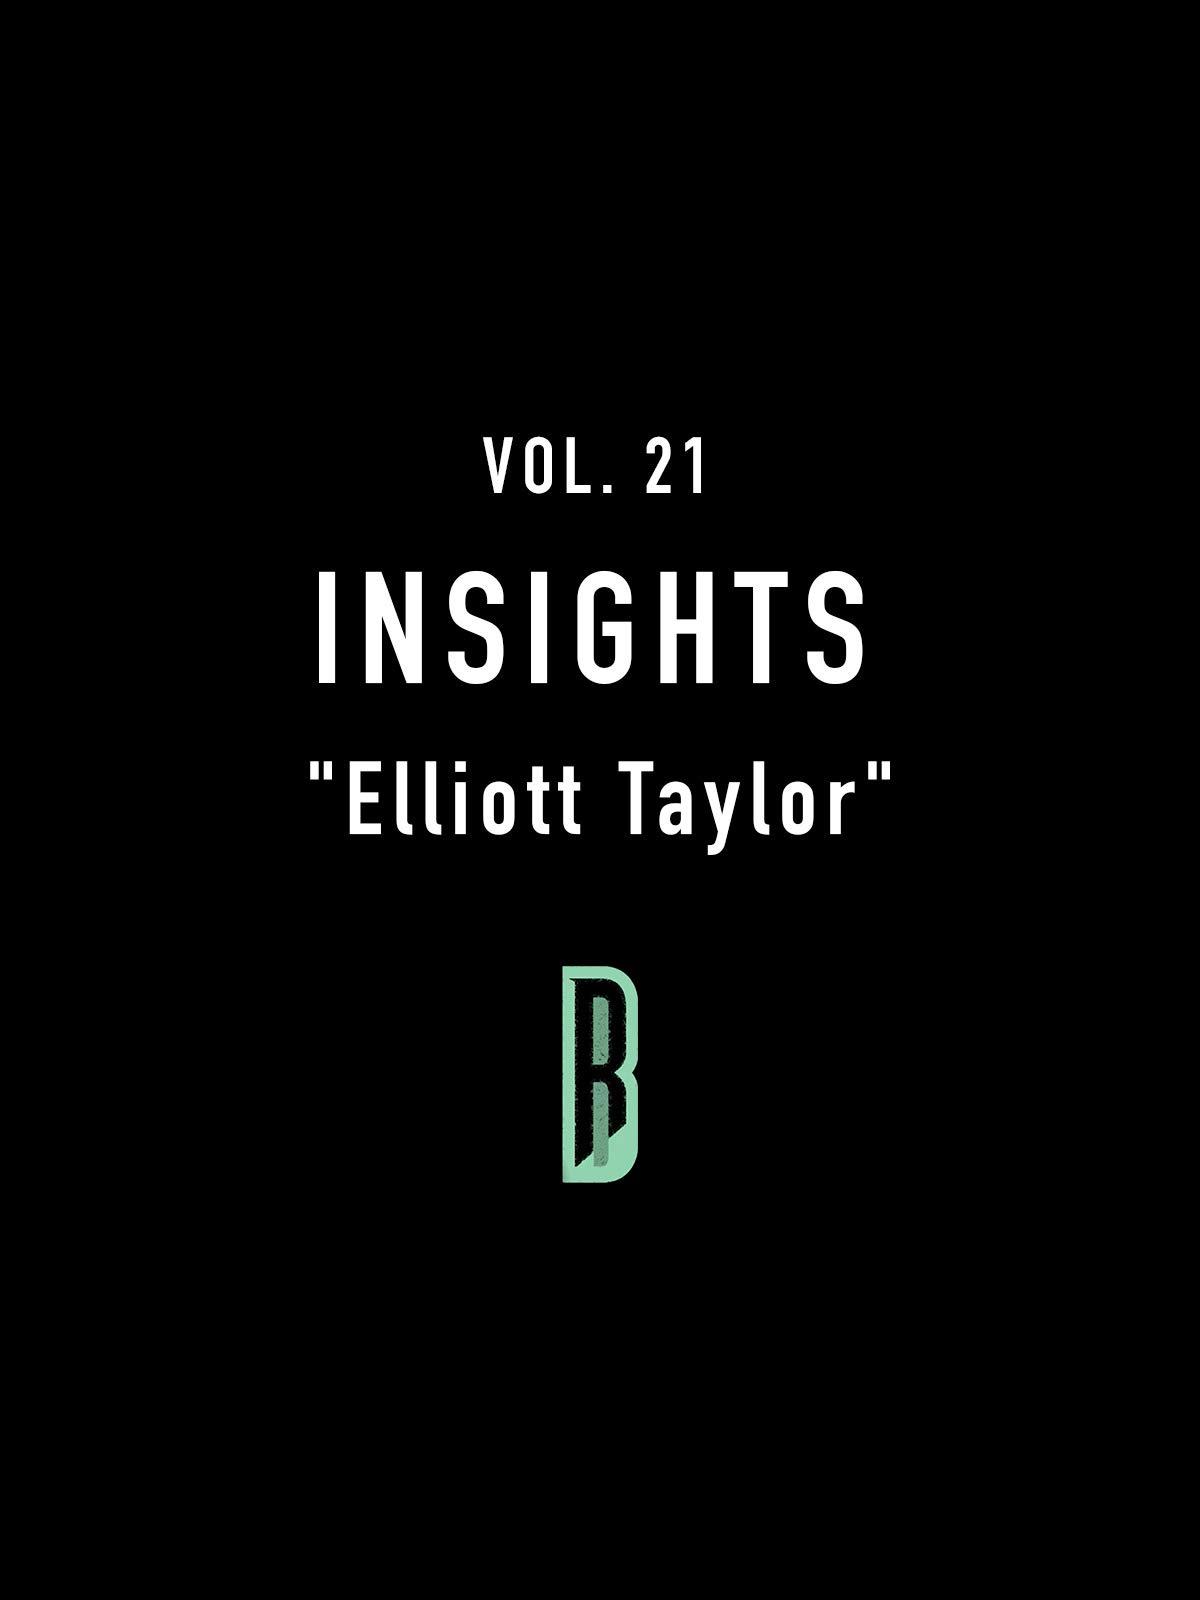 Insights Vol. 21